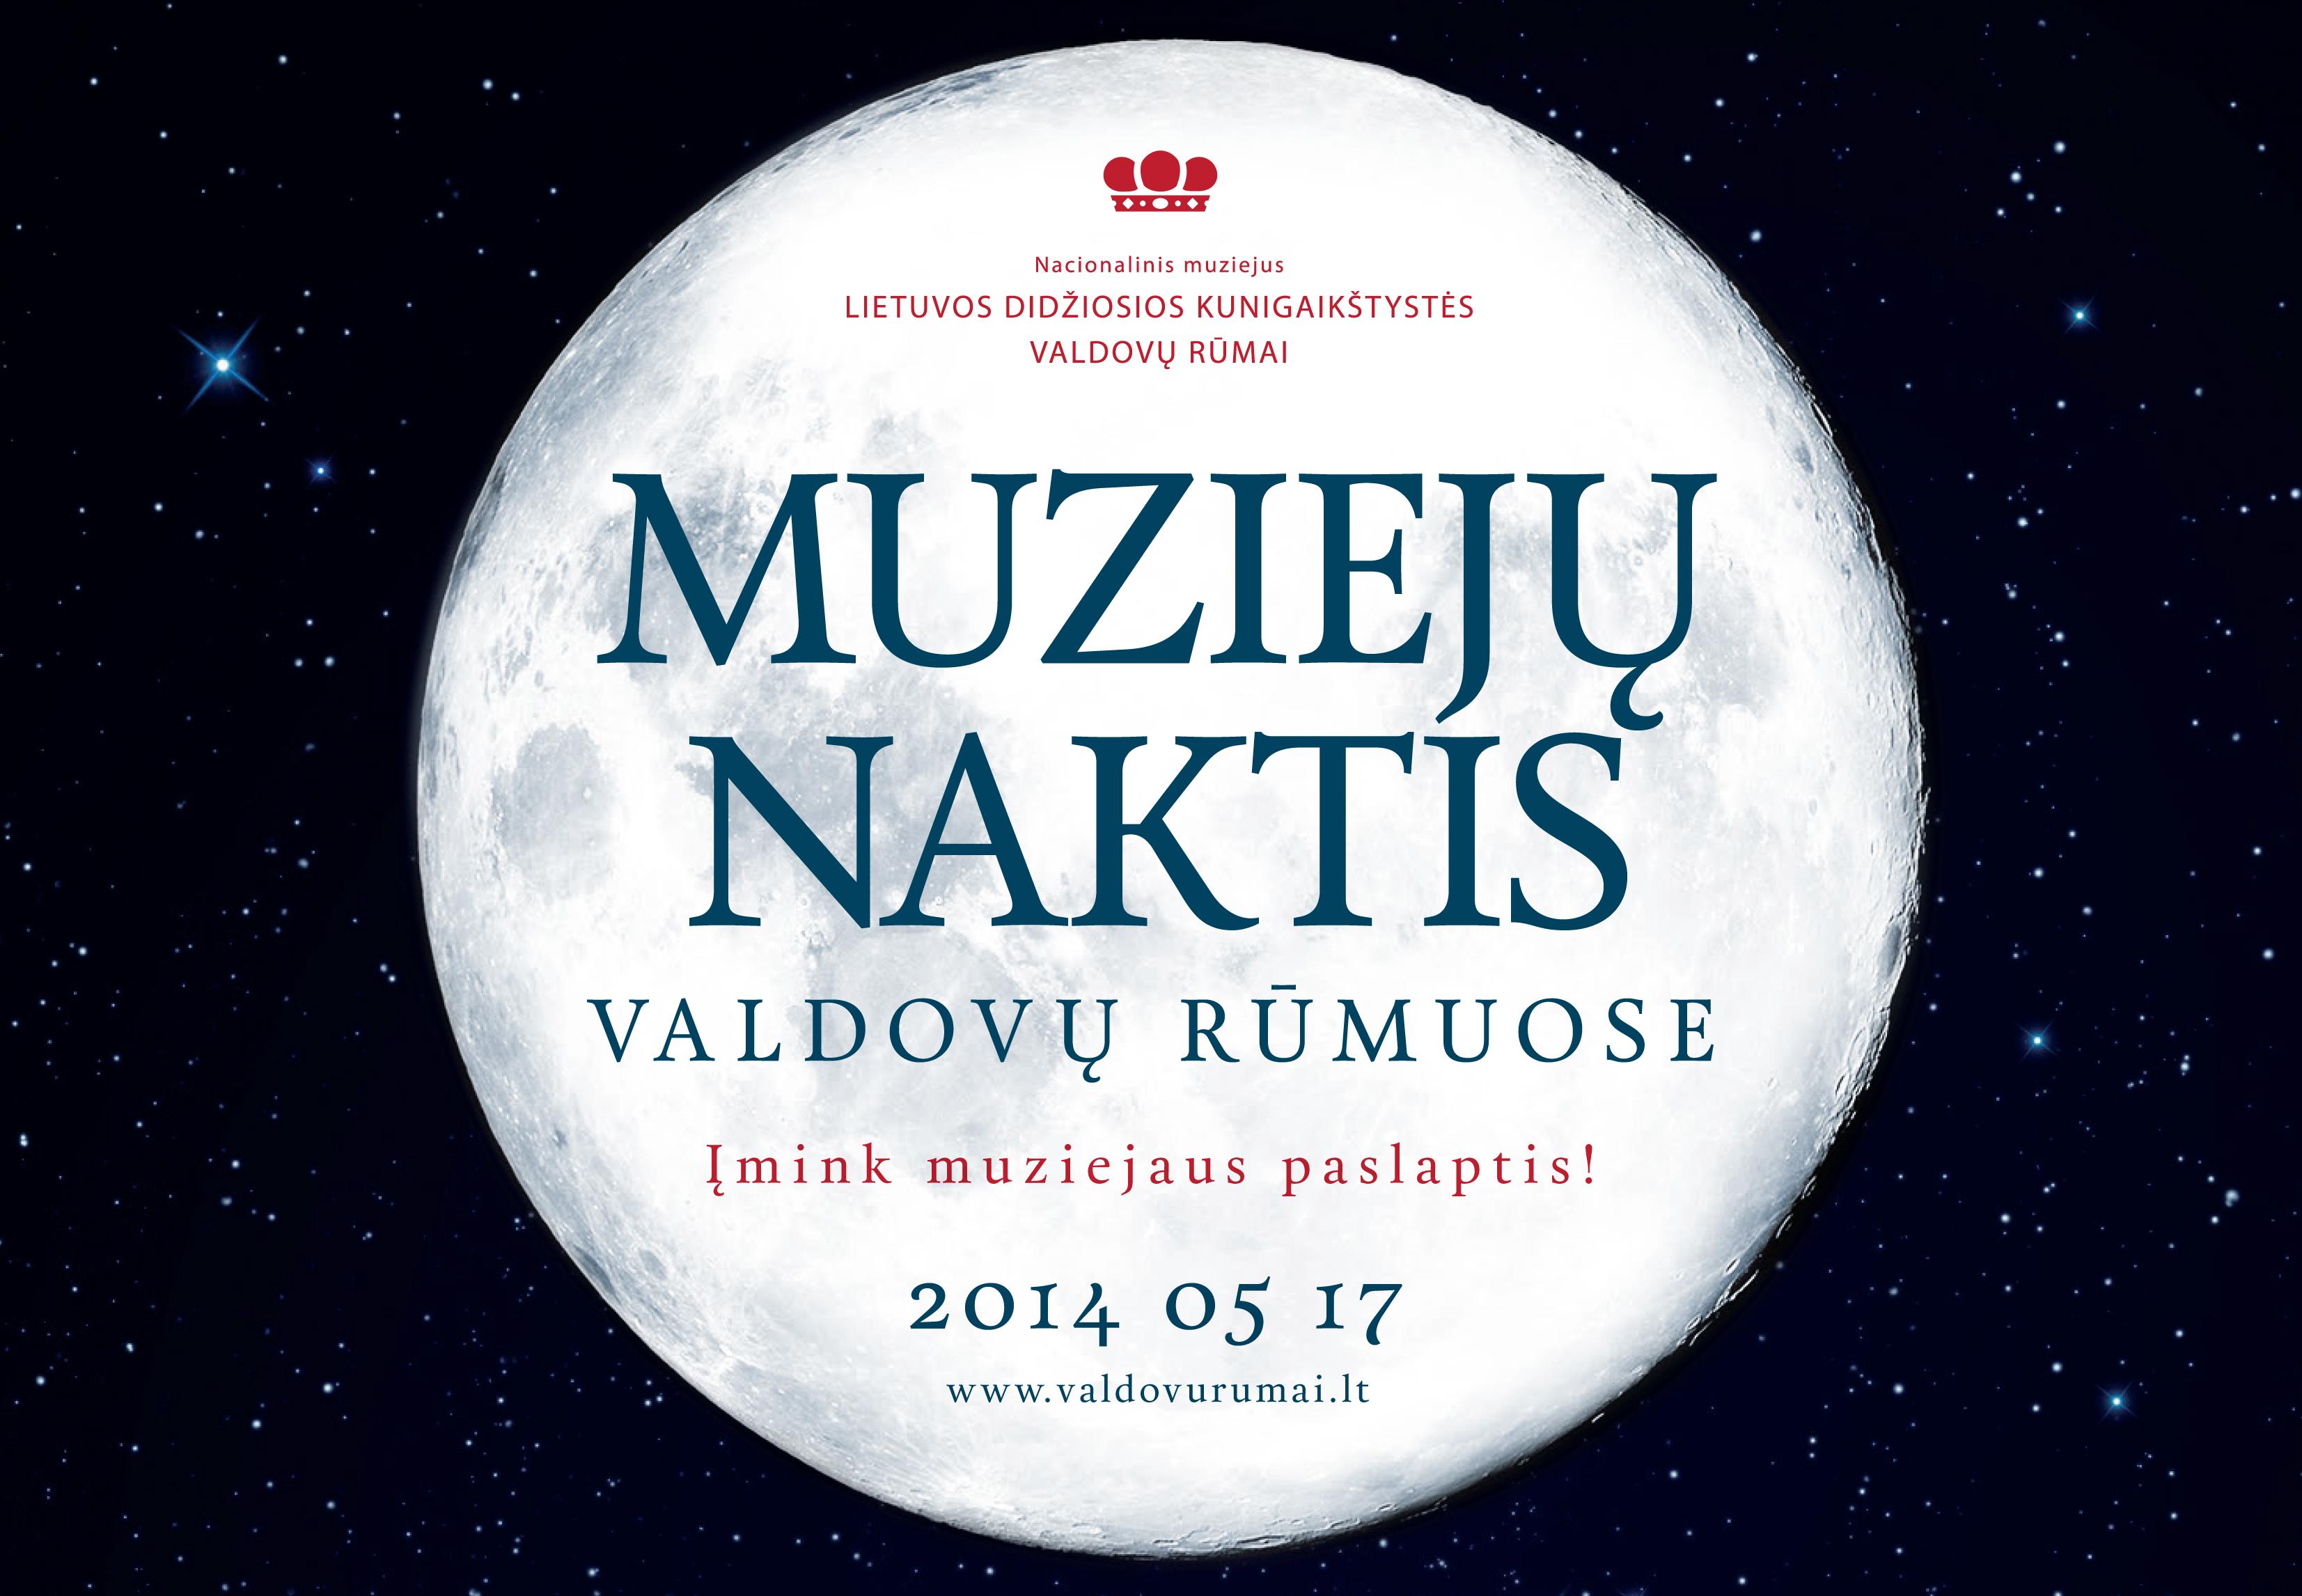 VR-muzieju-naktis-A3-20140429 copy